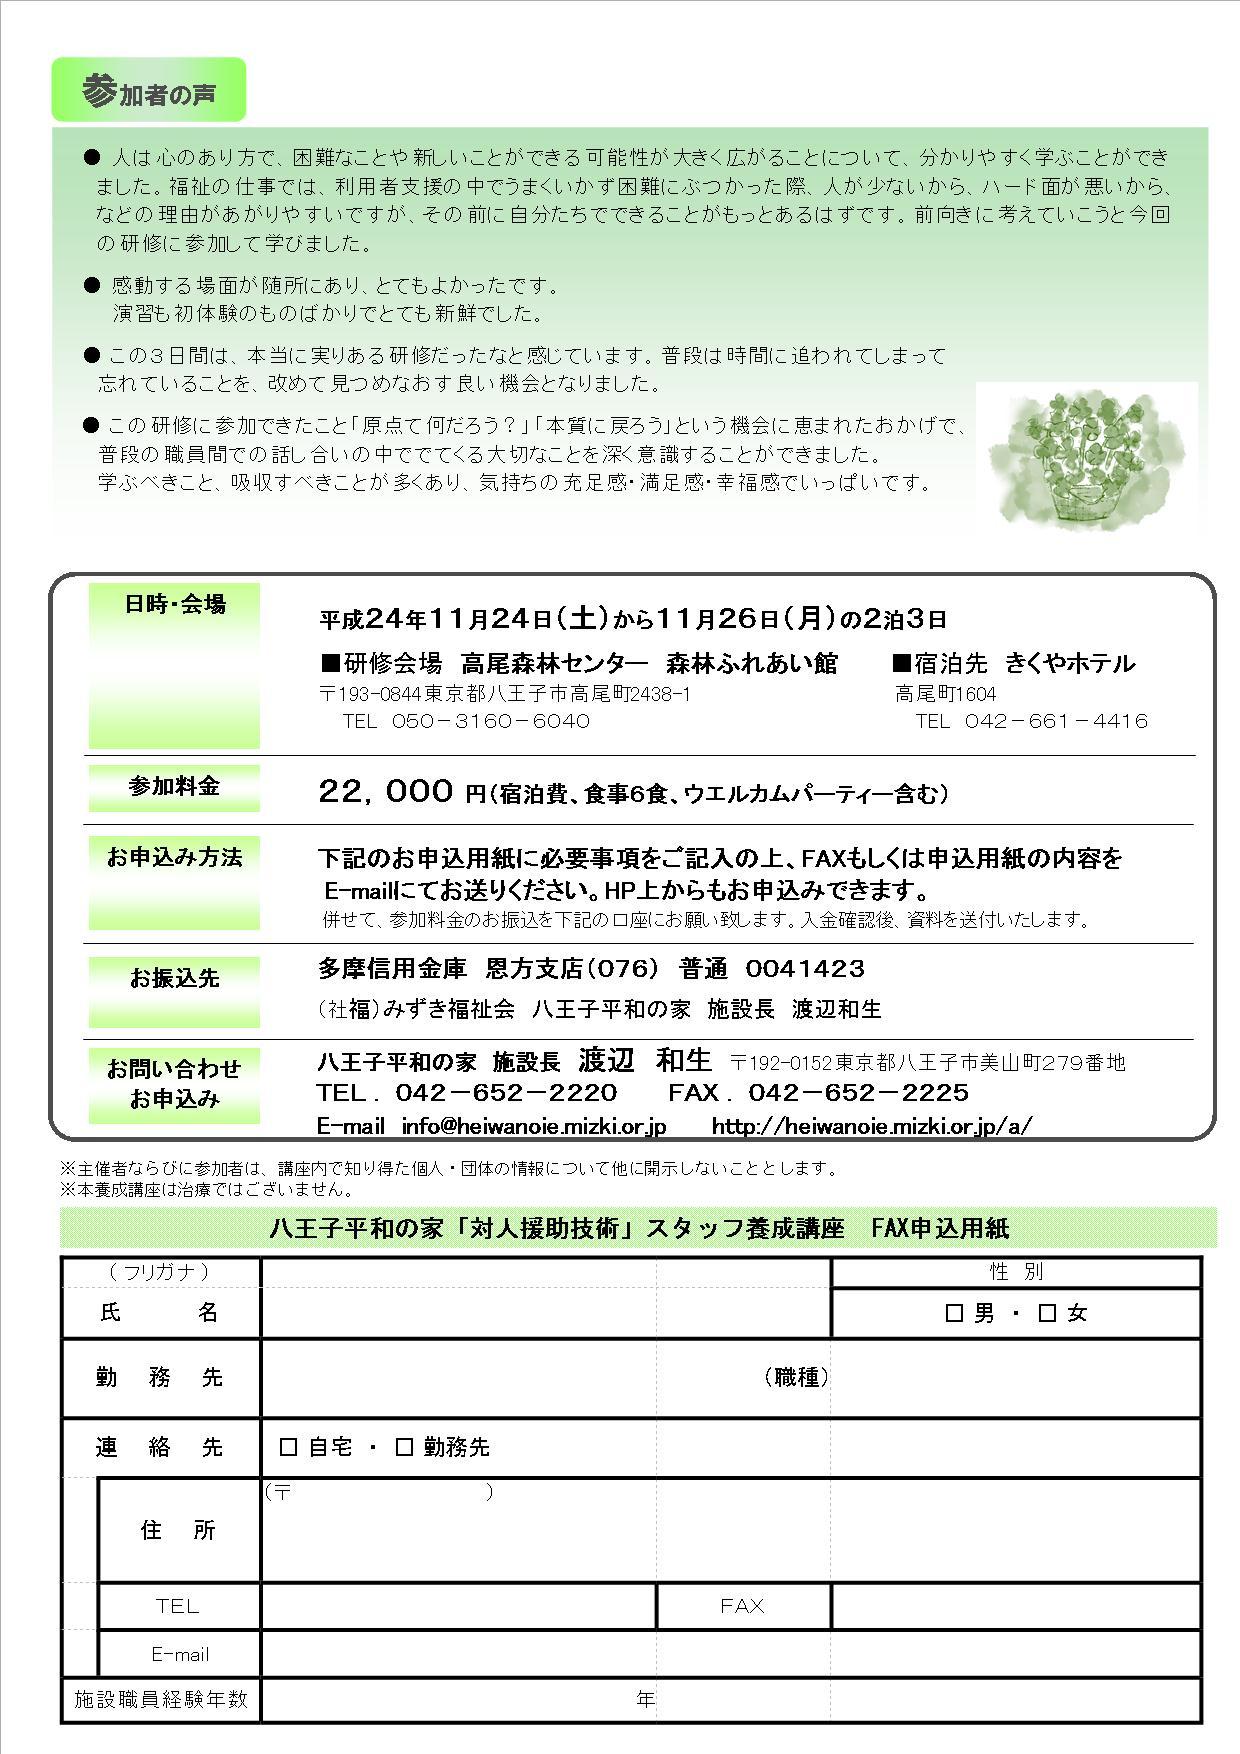 kokoro_2012_aki_4.jpg